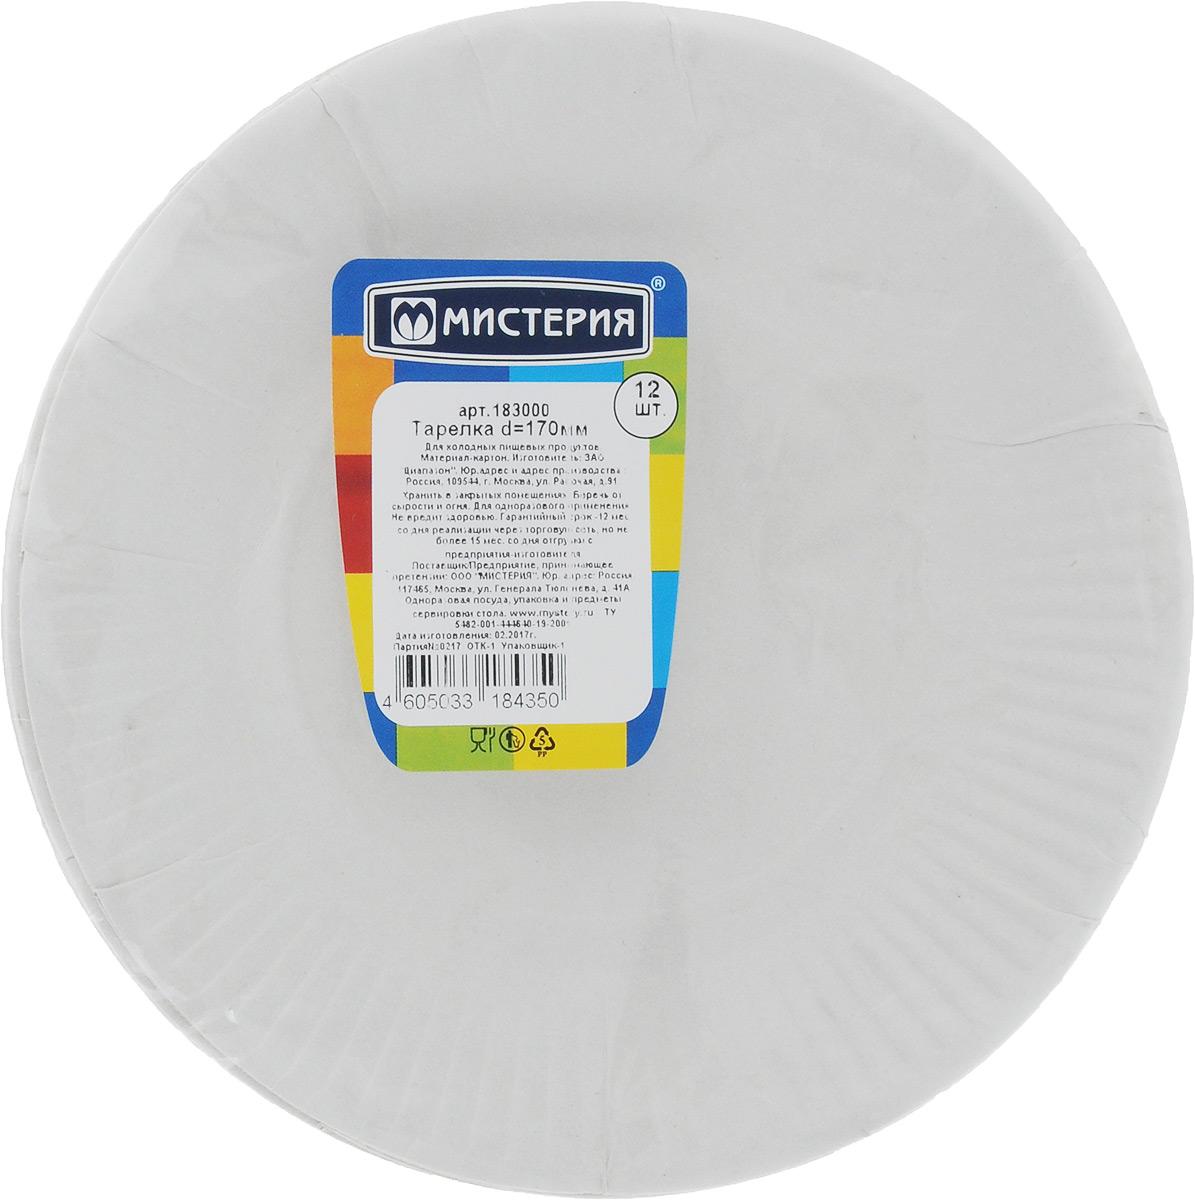 Набор одноразовых тарелок Мистерия, диаметр 17 см, 12 шт набор одноразовых ножей мистерия компакт 100 шт